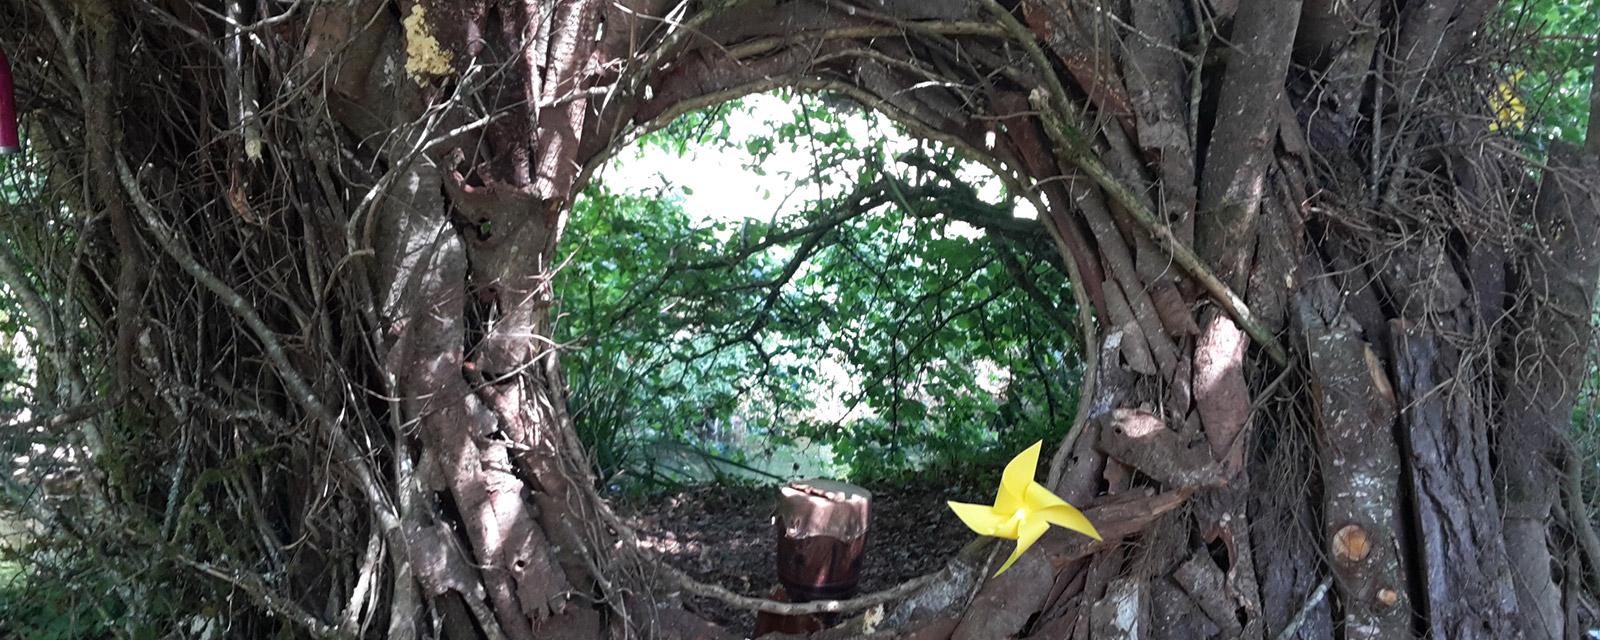 Hut or Land Art masterpiece?